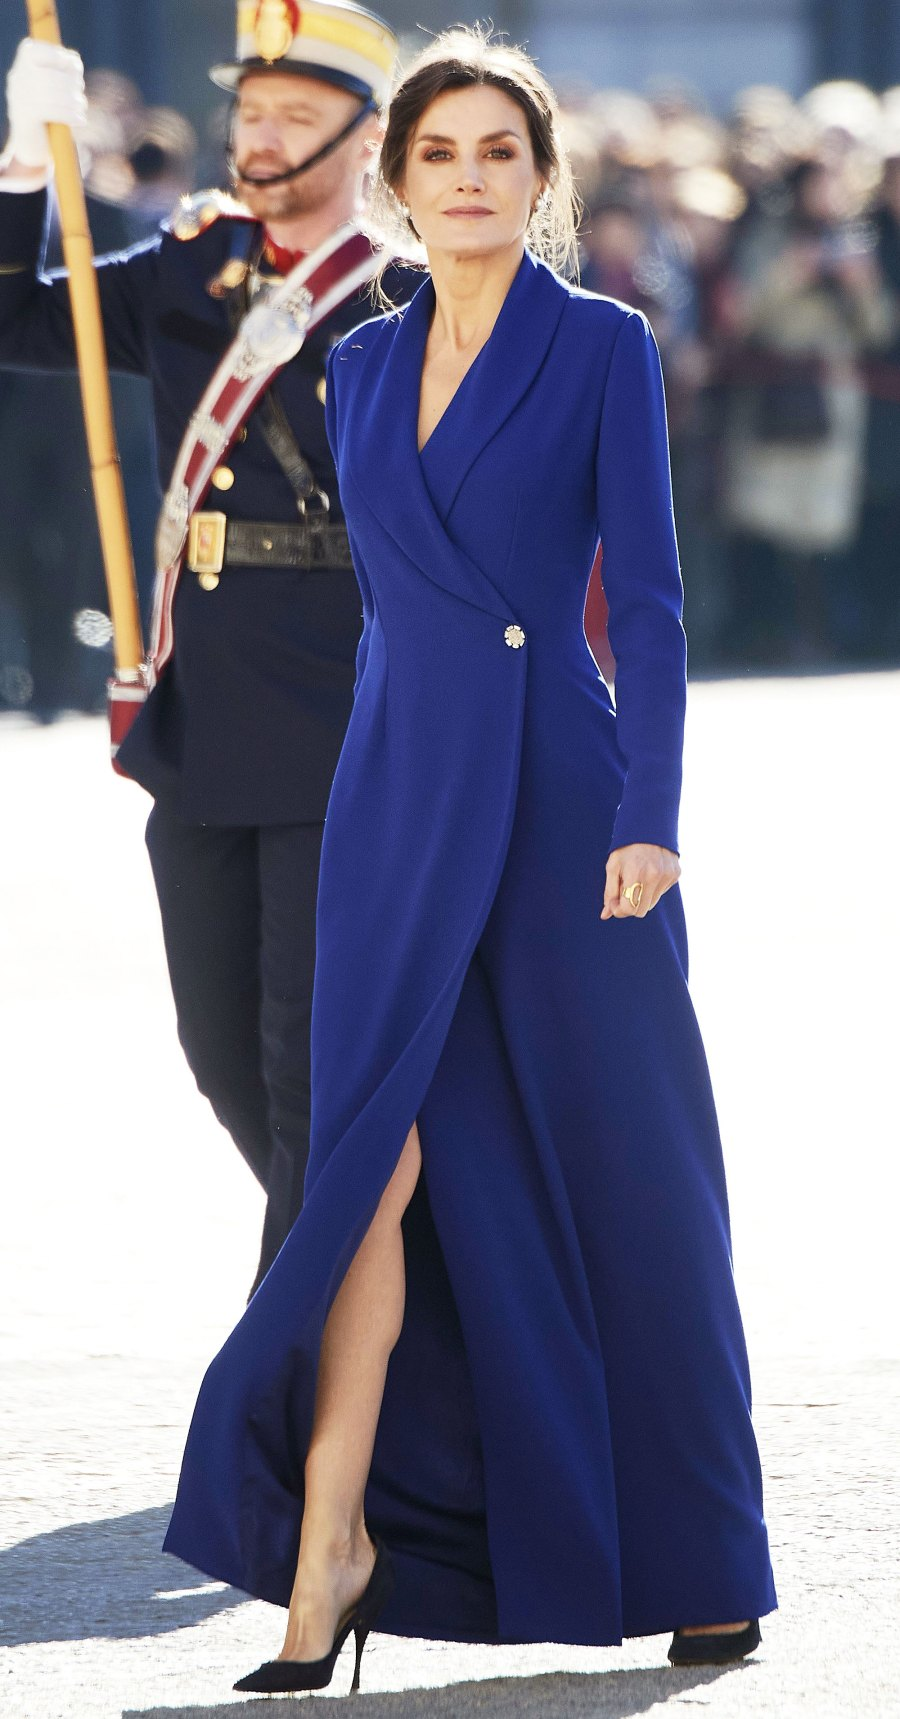 Queen Letizia Coat Dress January 6, 2020